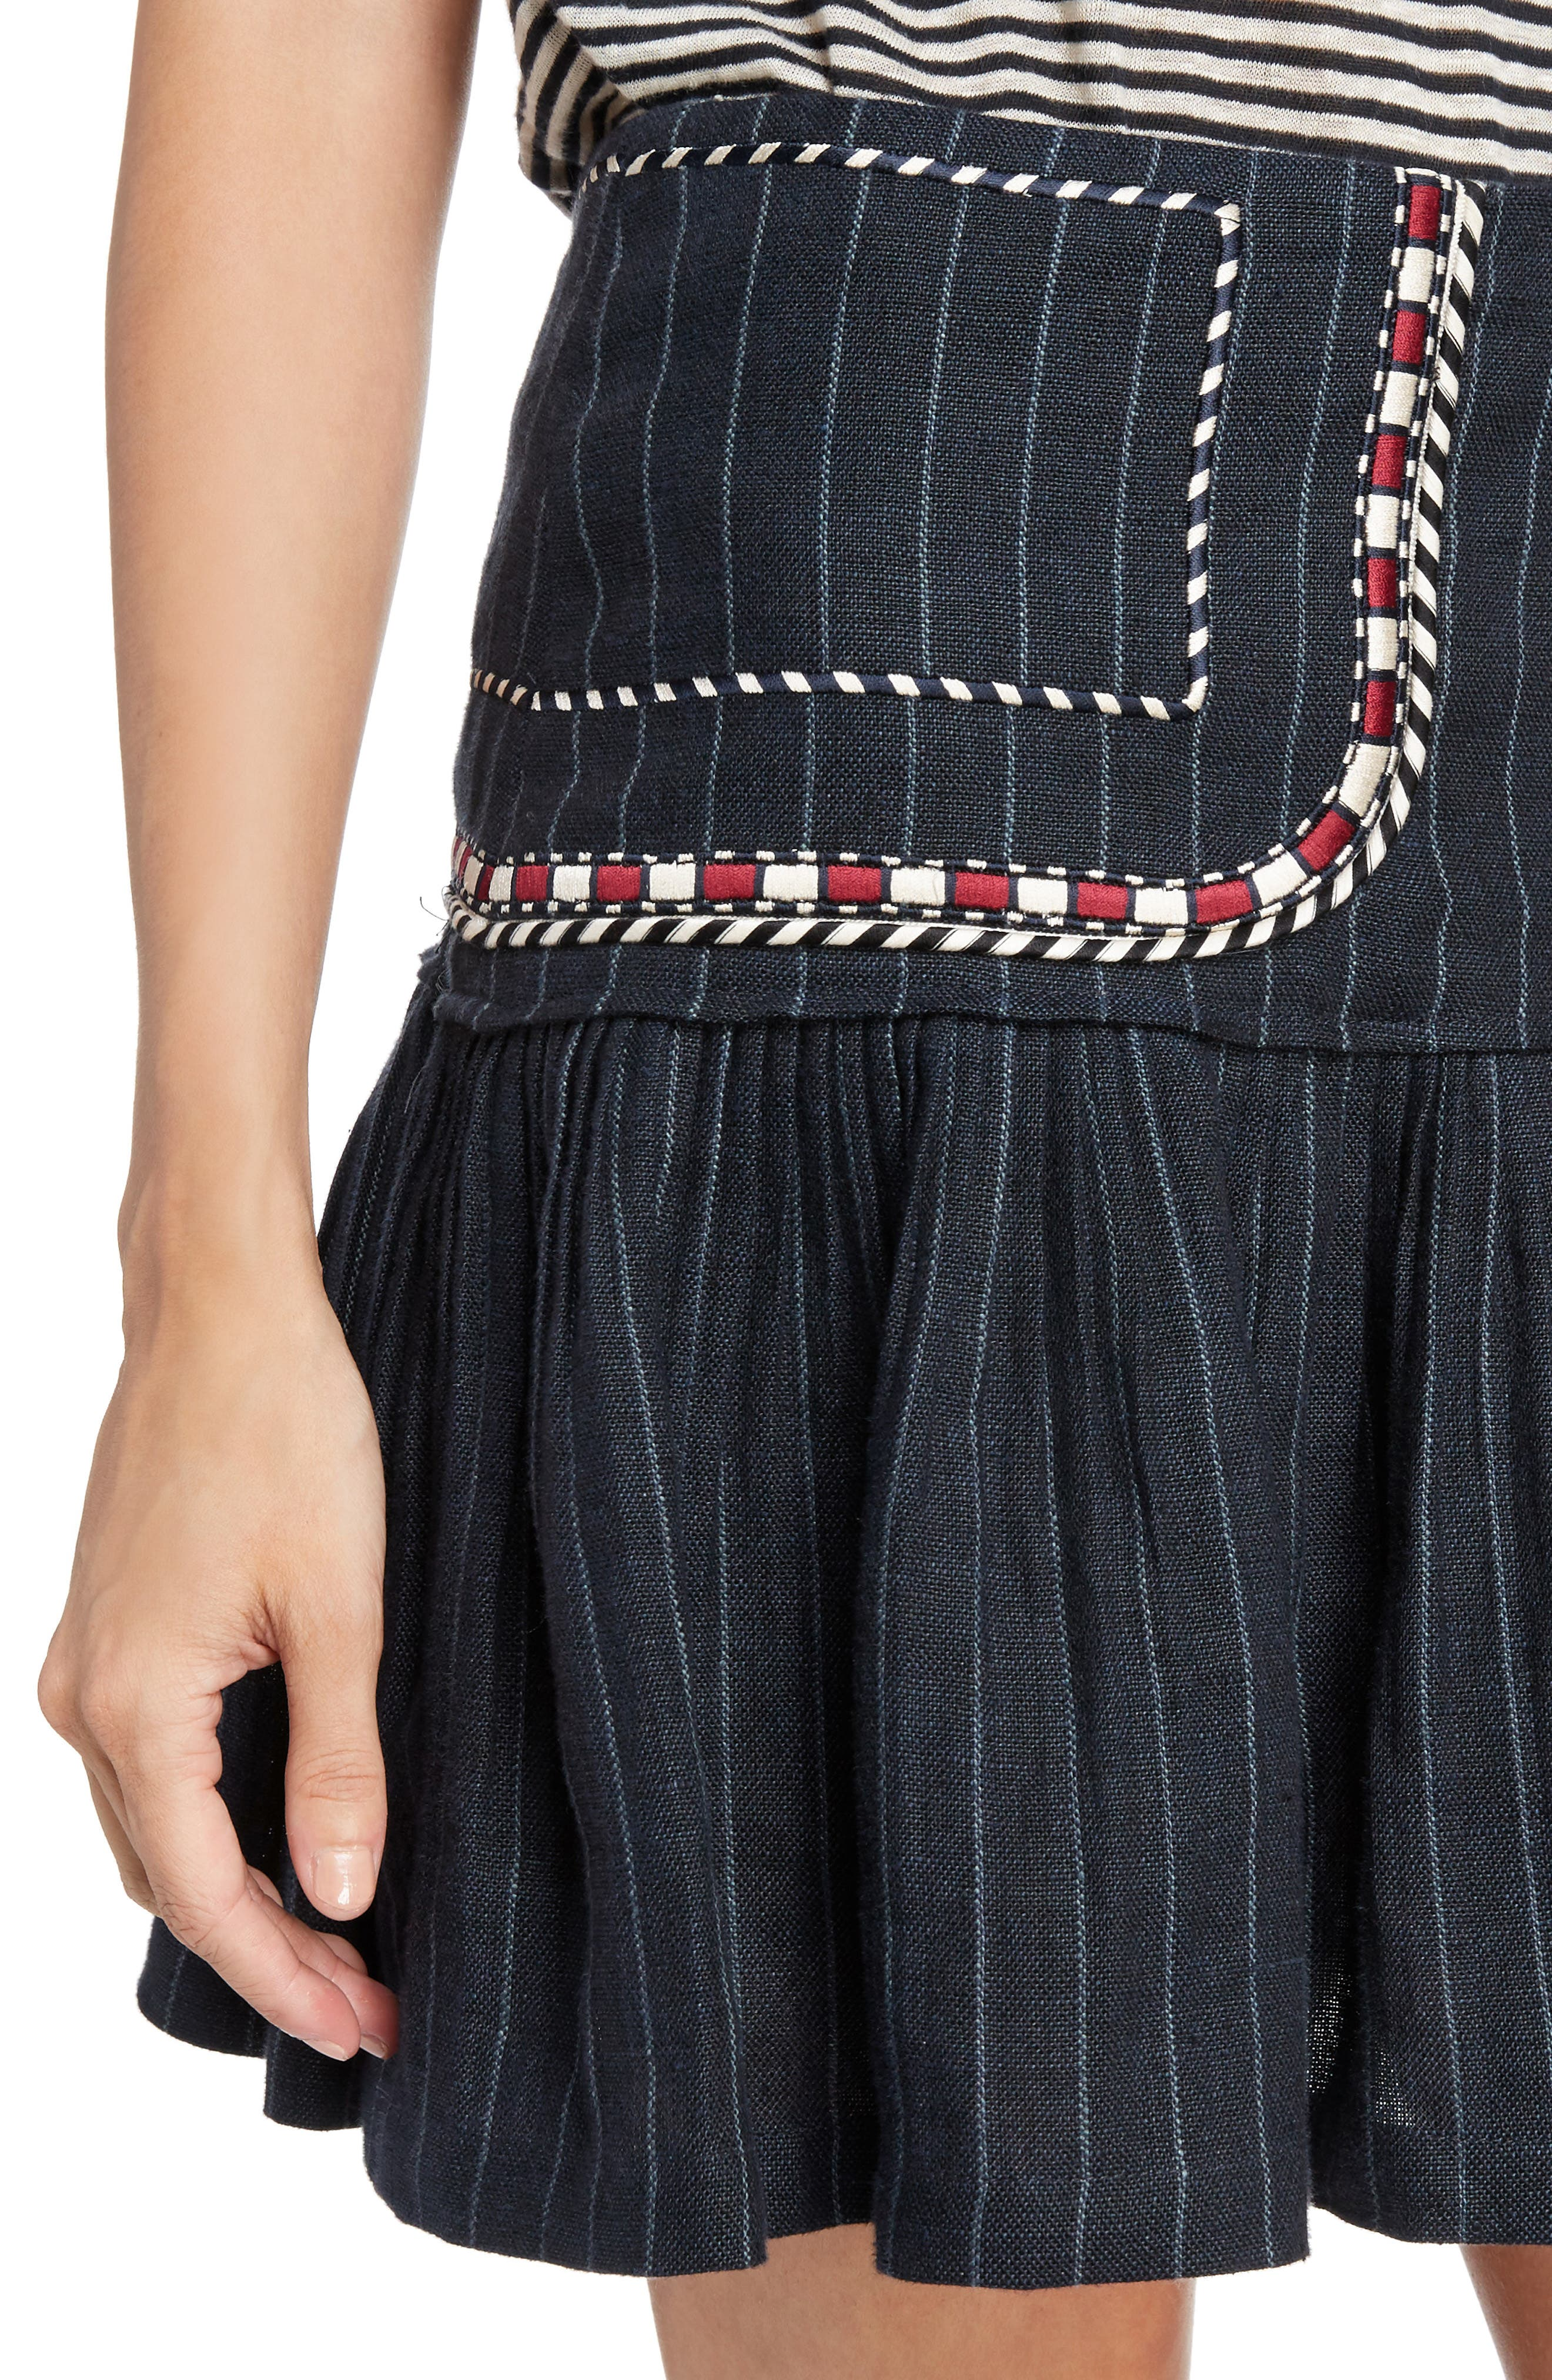 Isabel Marant Étoile Jessie Embroidered Linen Skirt,                             Alternate thumbnail 4, color,                             Midnight